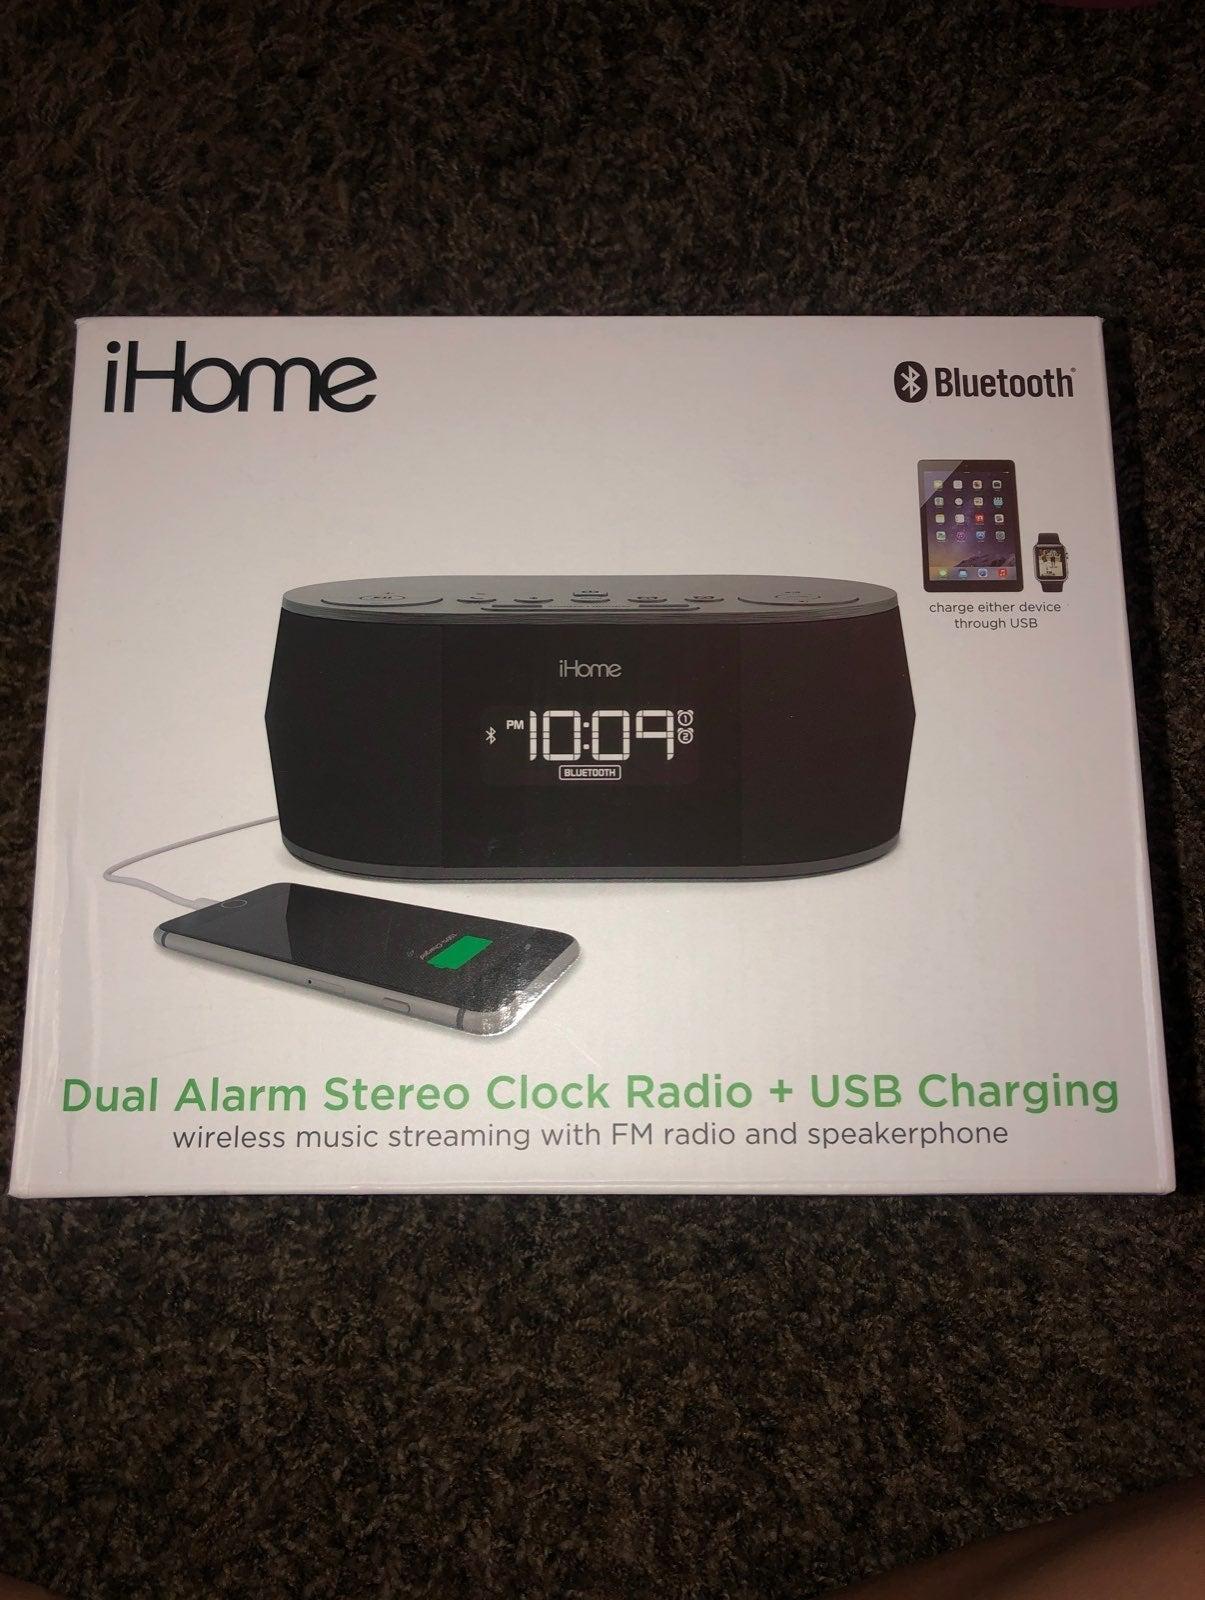 iHome alarm stereo clock + charging